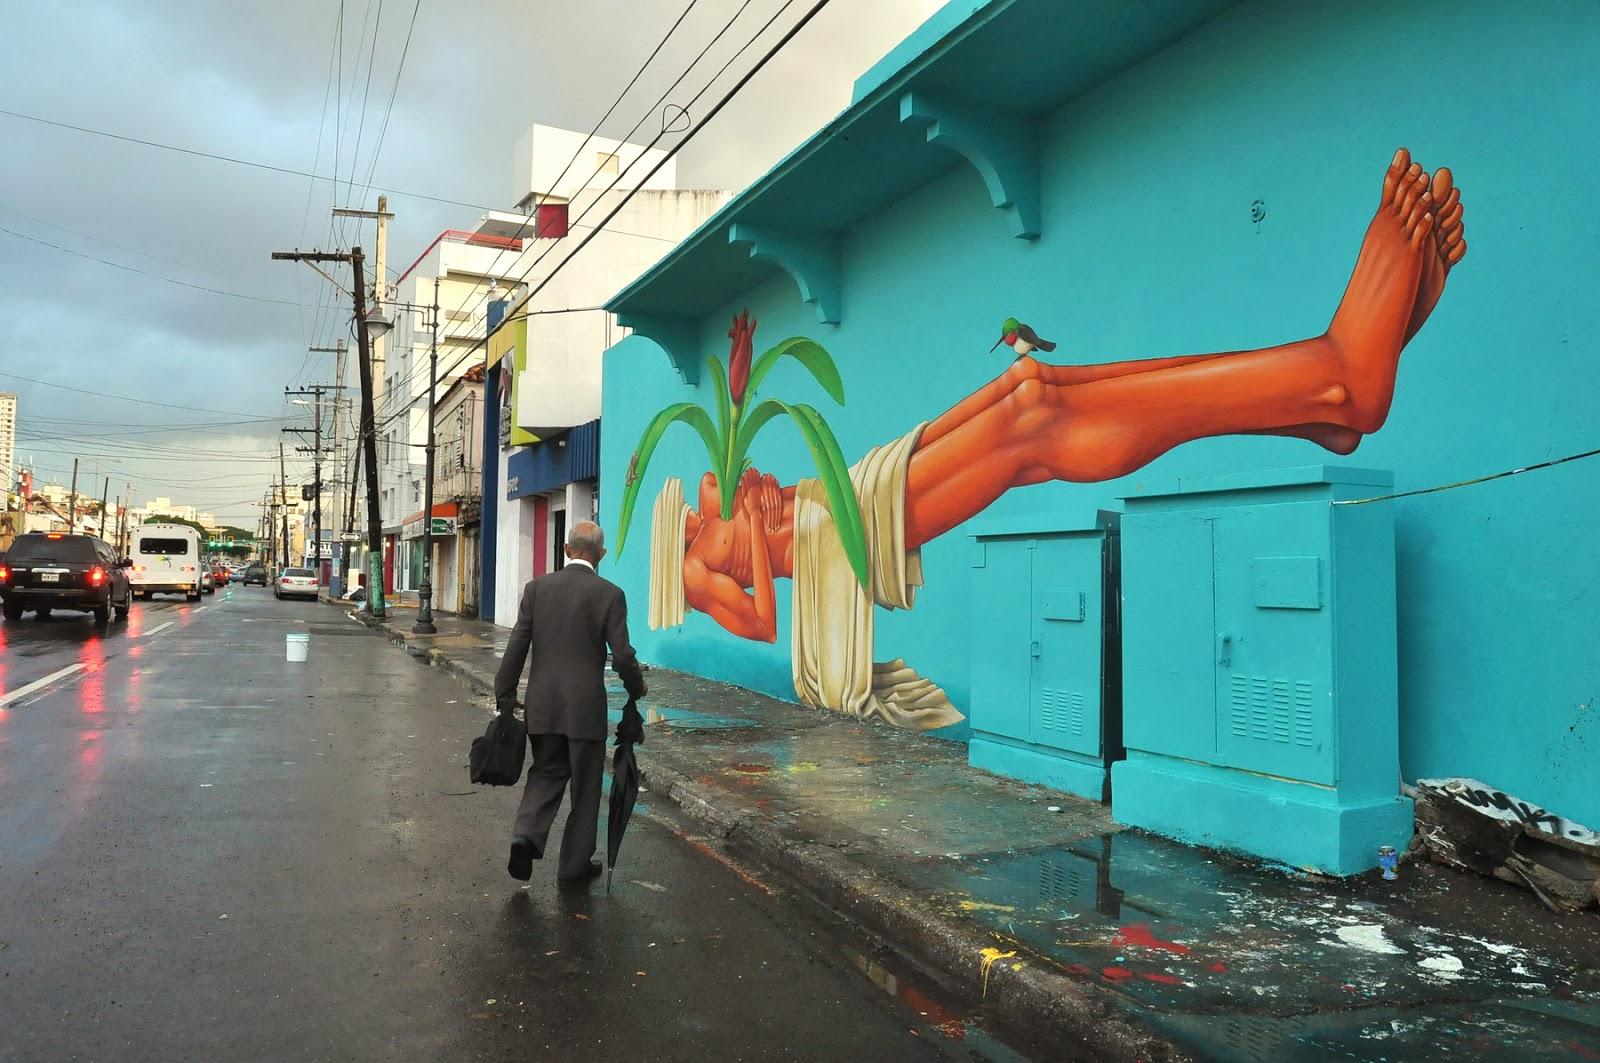 interesni-kazki-new-mural-los-muros-hablan-08